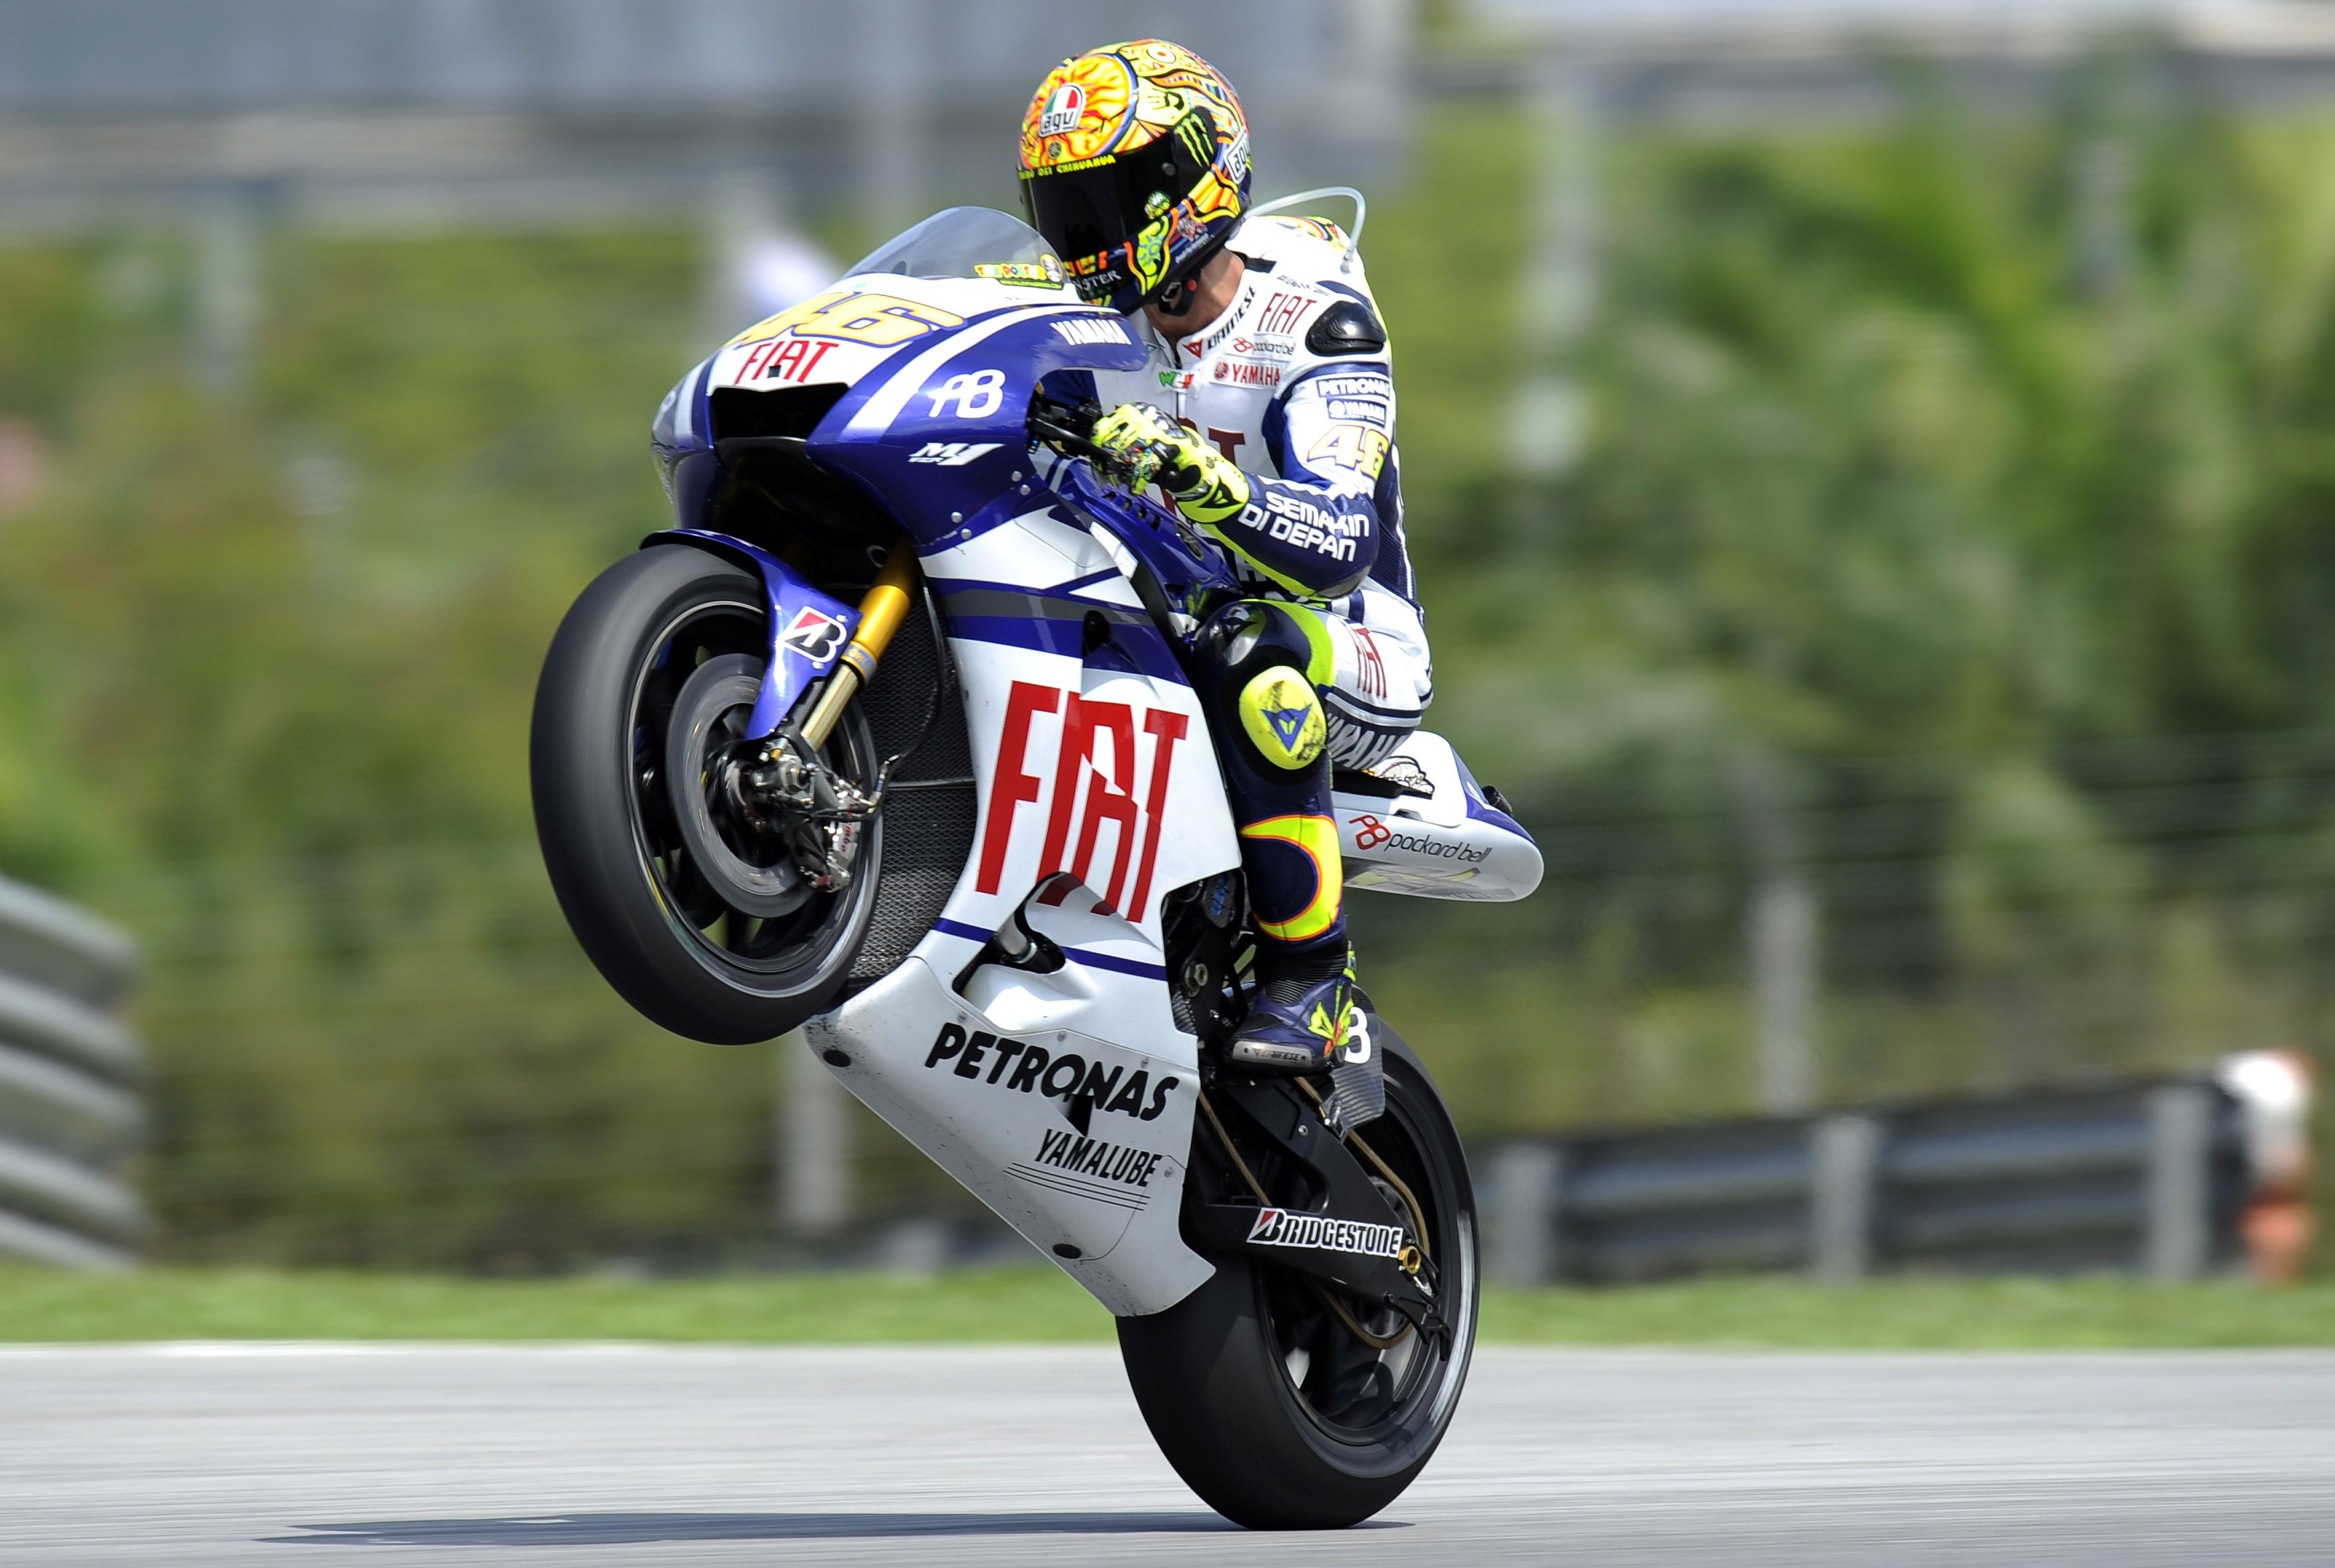 MotoGP Qatar race results—Rossi wins a thriller! Ultra